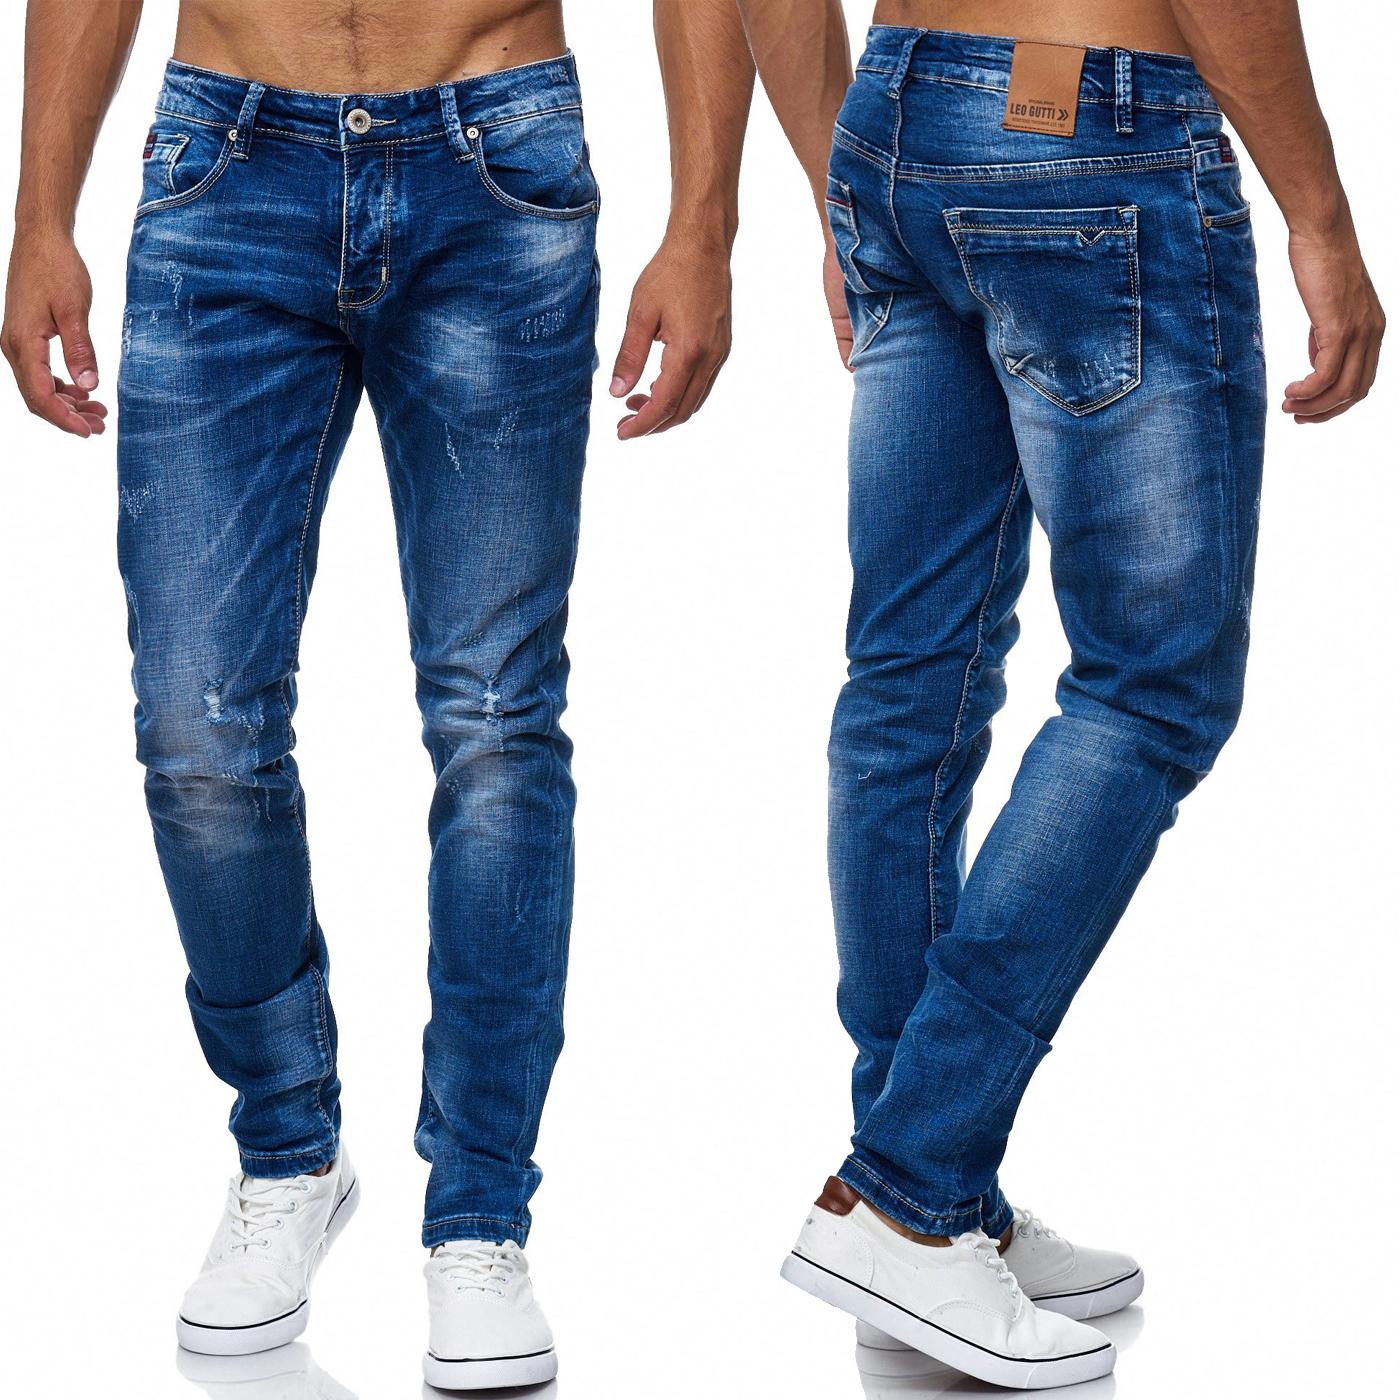 herren jeans destroyed ripped zerrissen used l cher risse. Black Bedroom Furniture Sets. Home Design Ideas